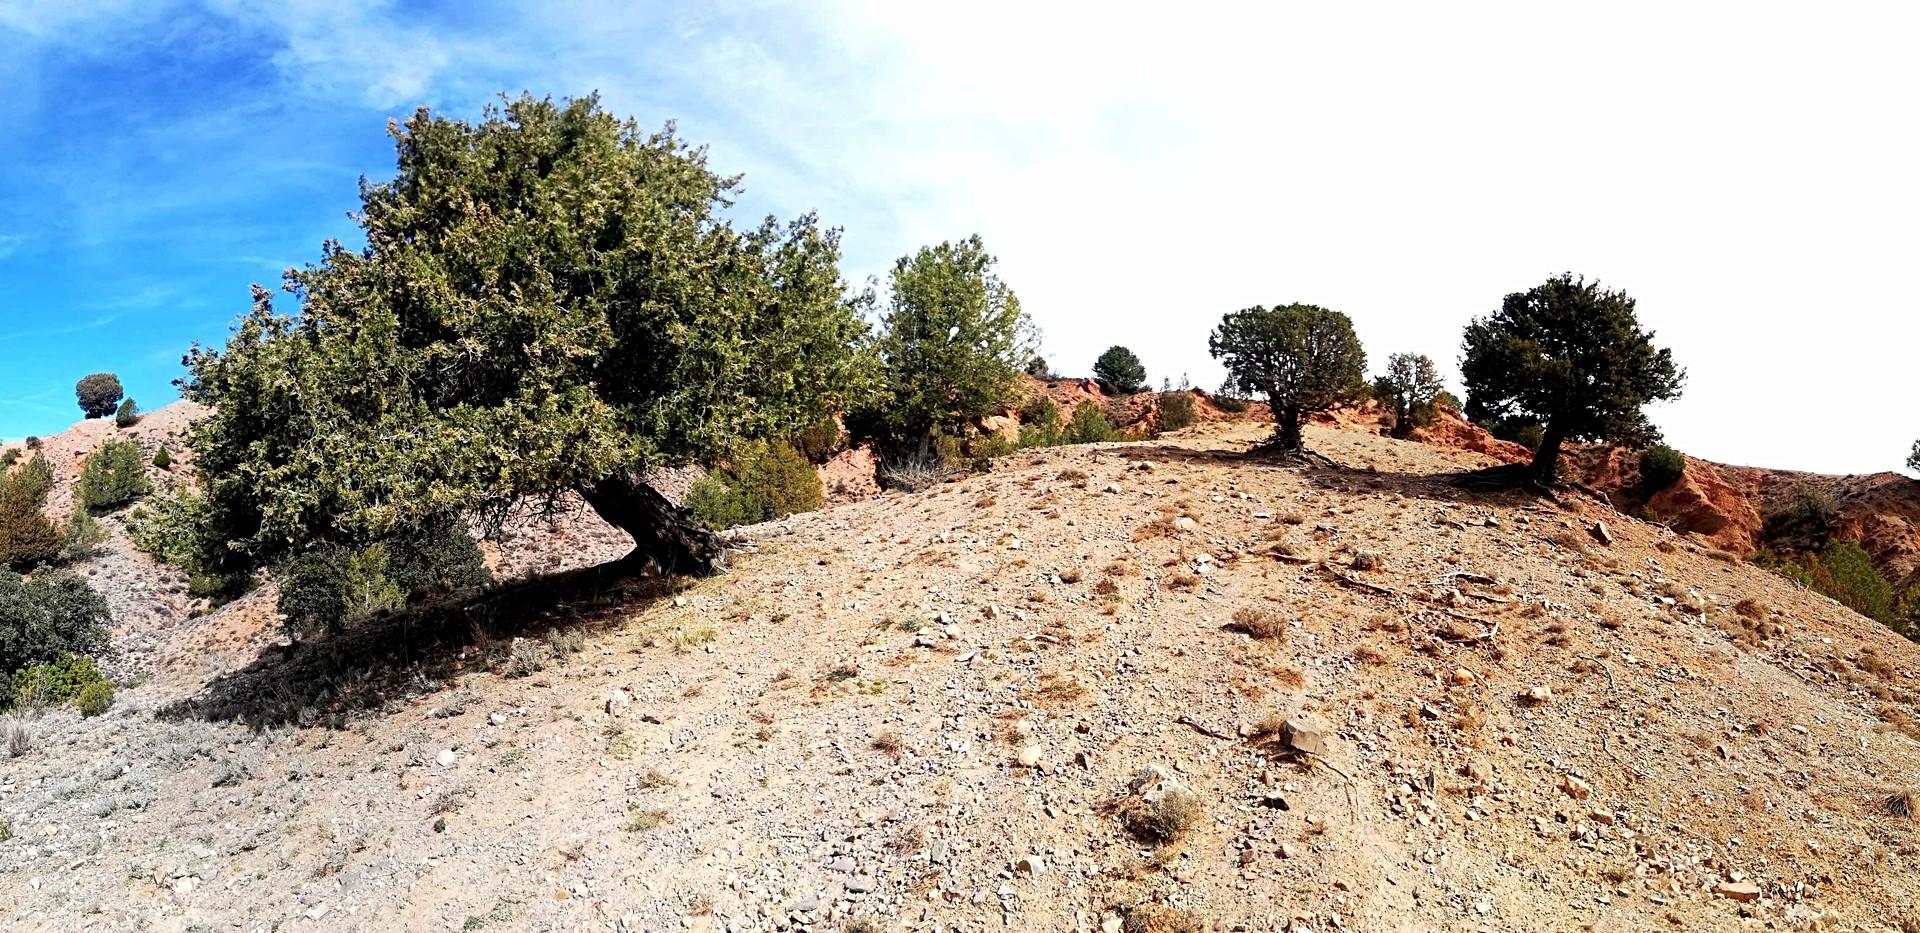 Sabinar / Sabinas Forest